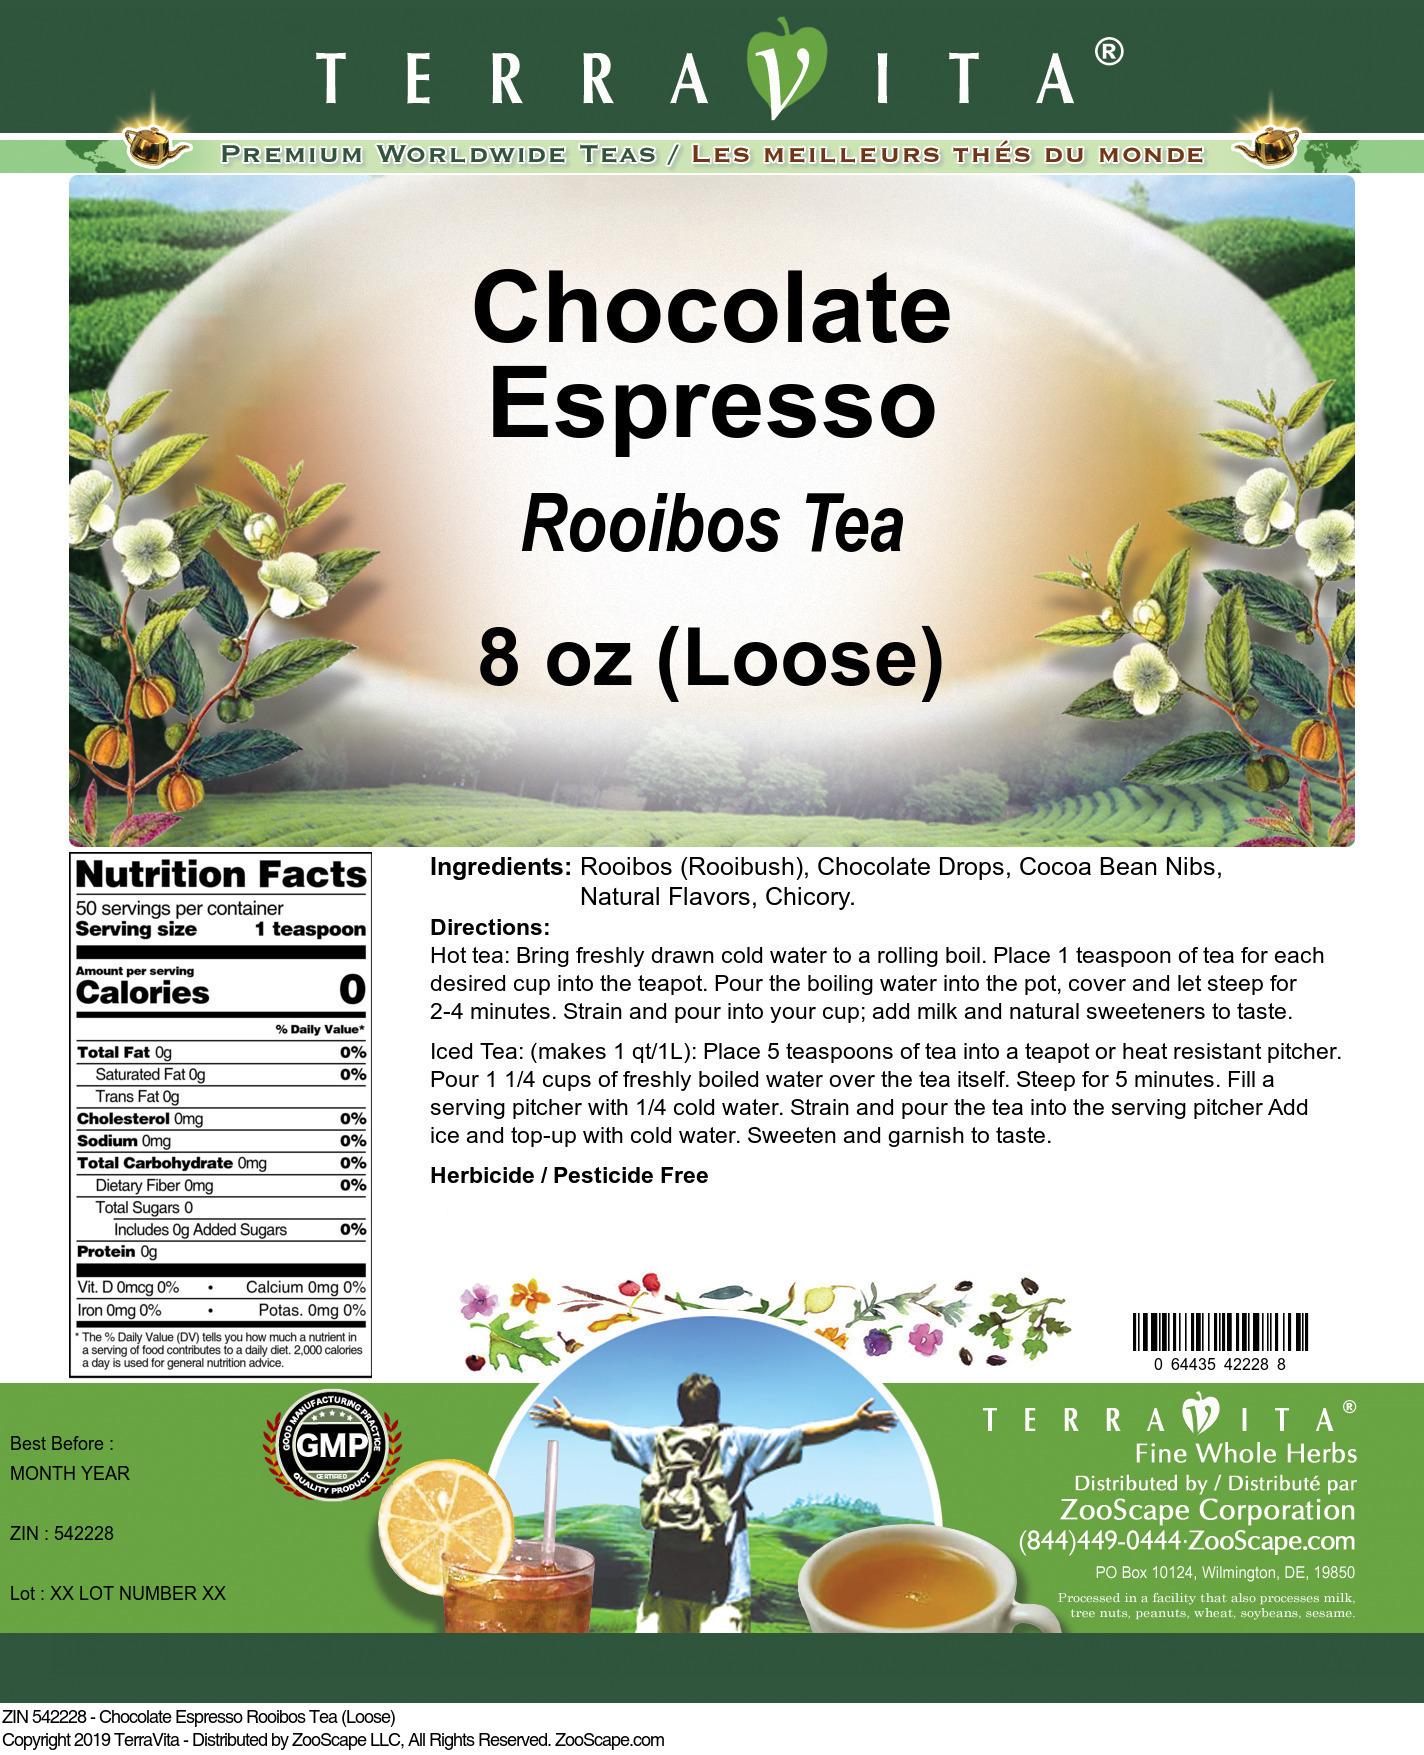 Chocolate Espresso Rooibos Tea